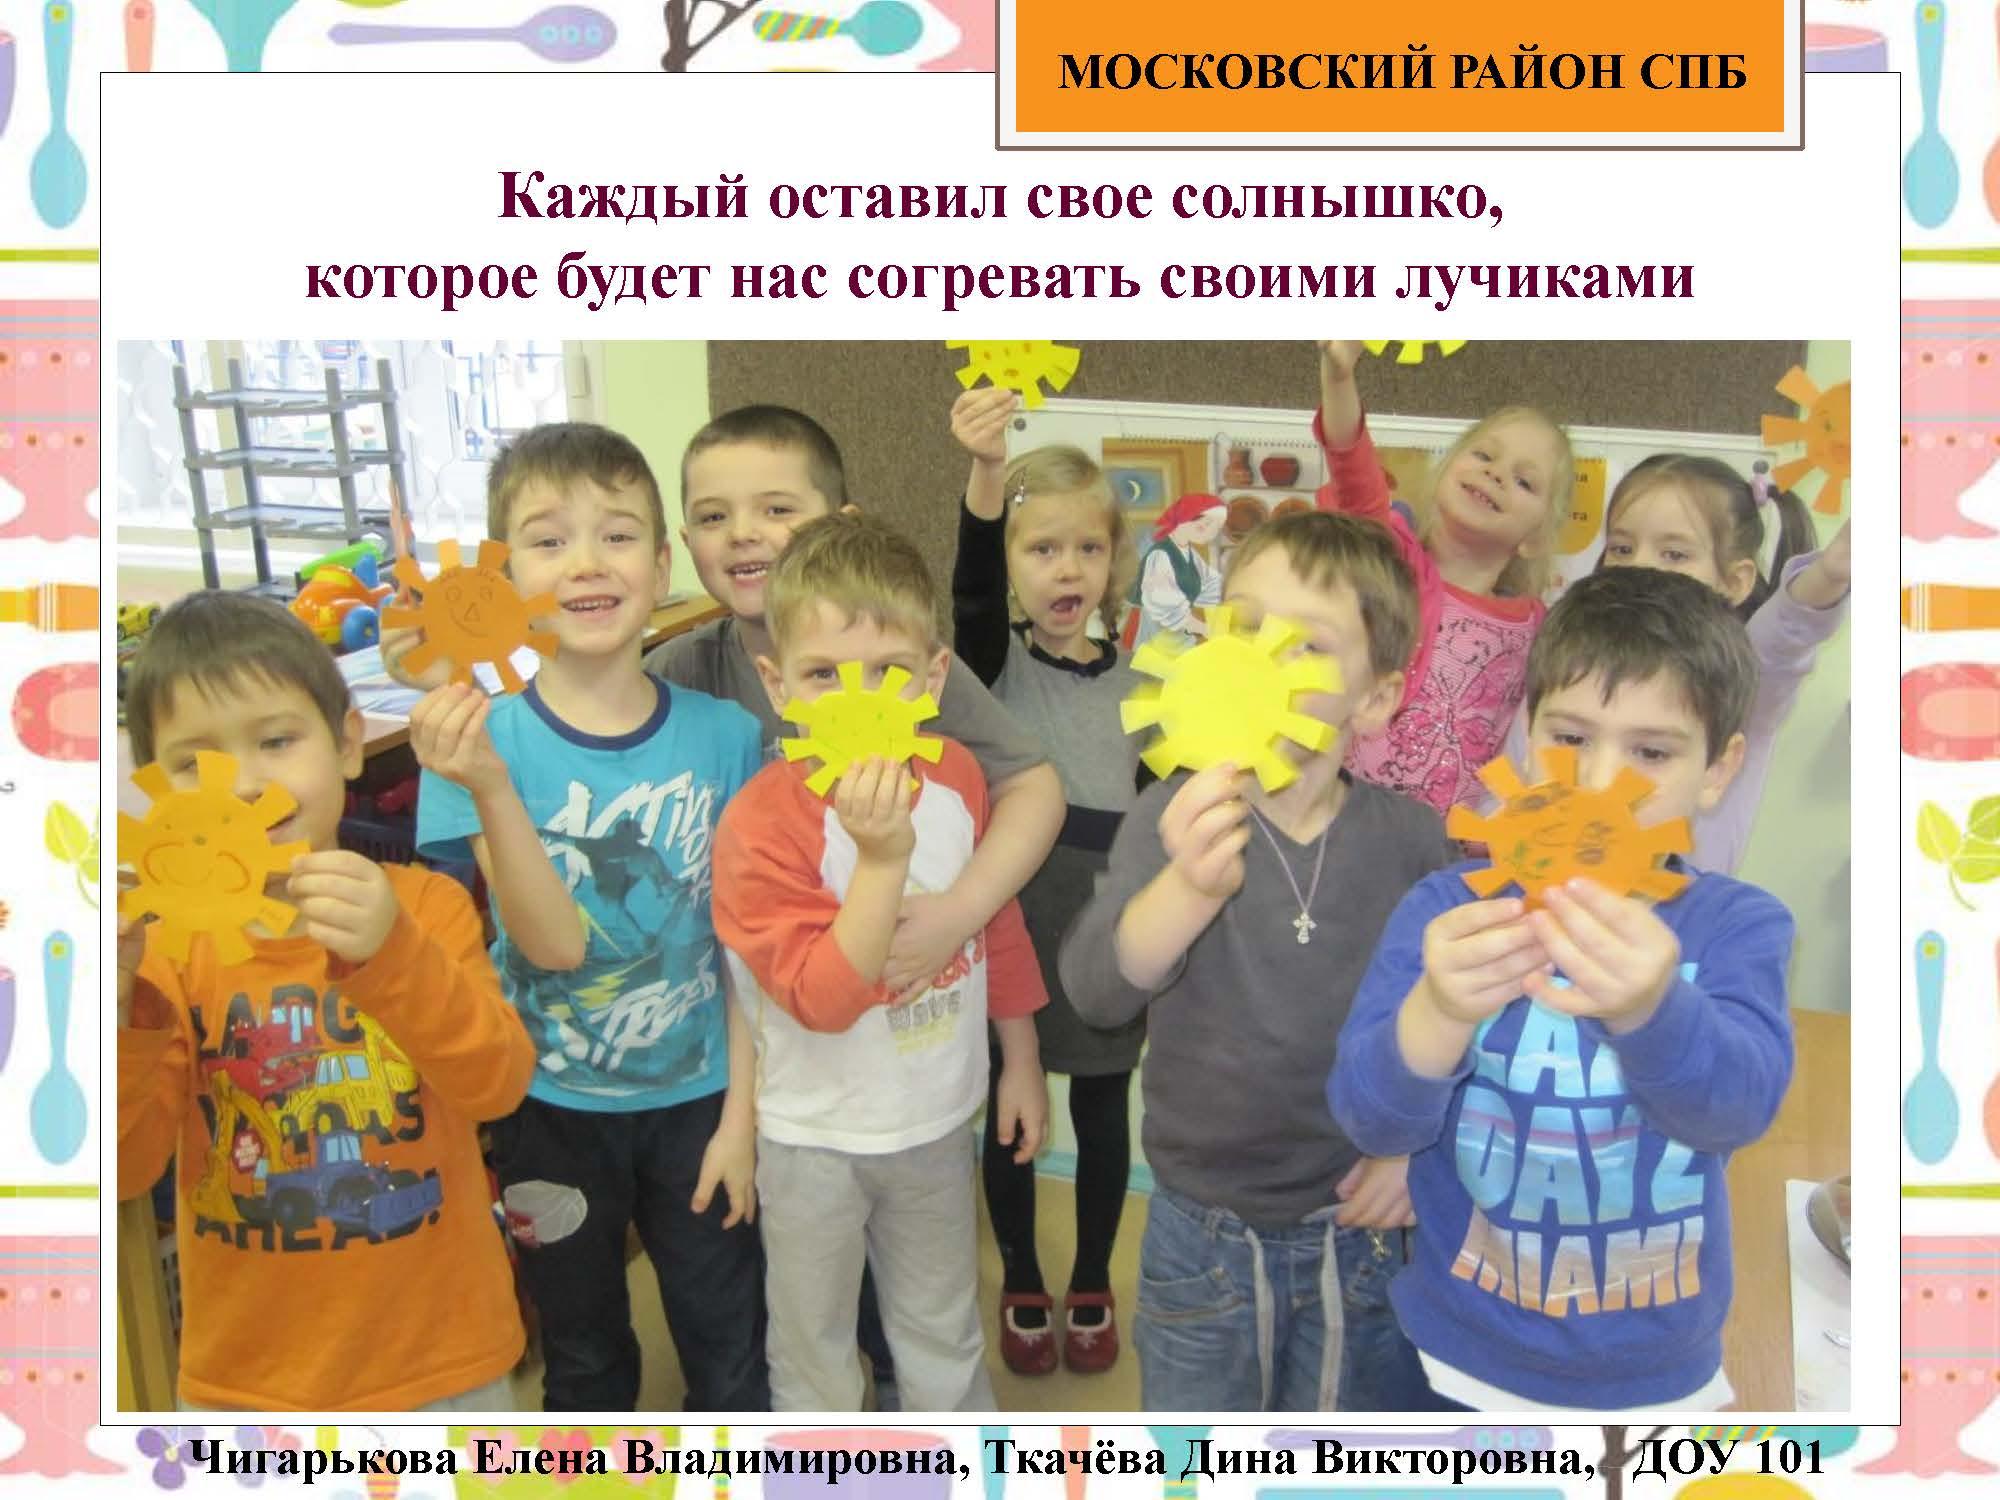 Секция 8. ДОУ 101, ПСИ. Московский район_Страница_24